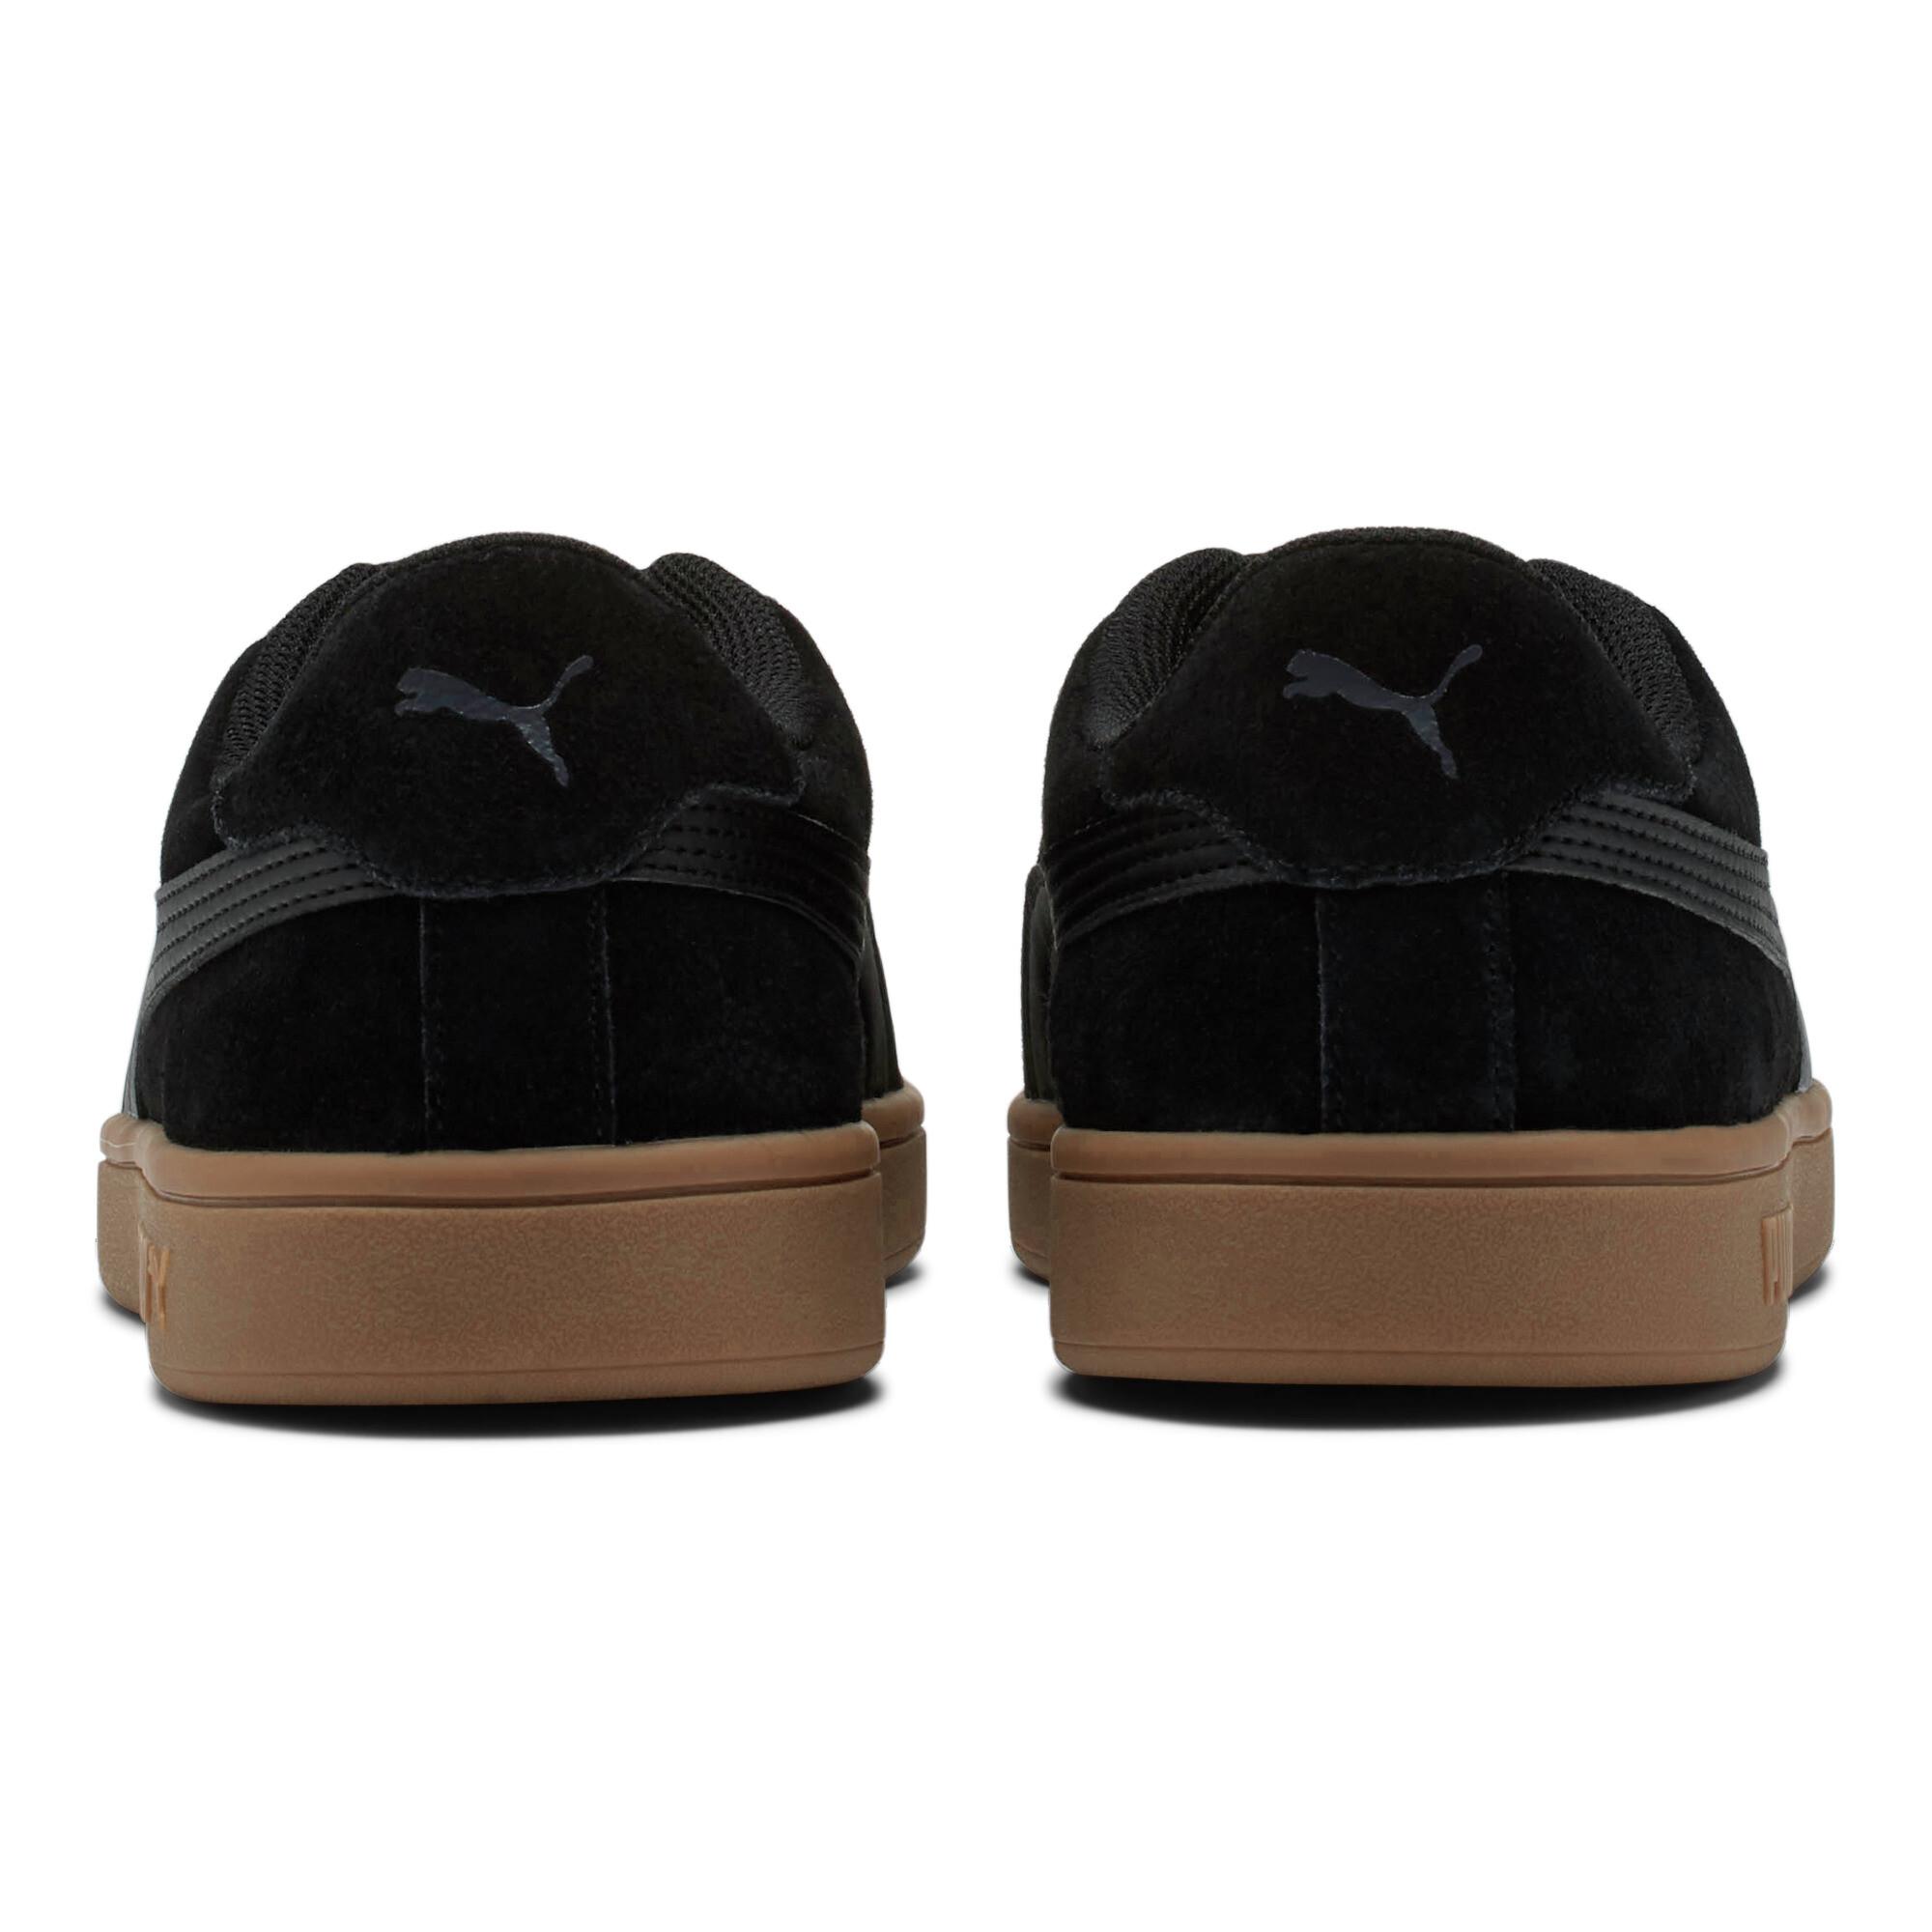 miniature 7 - Puma Men's Smash v2 Sneakers